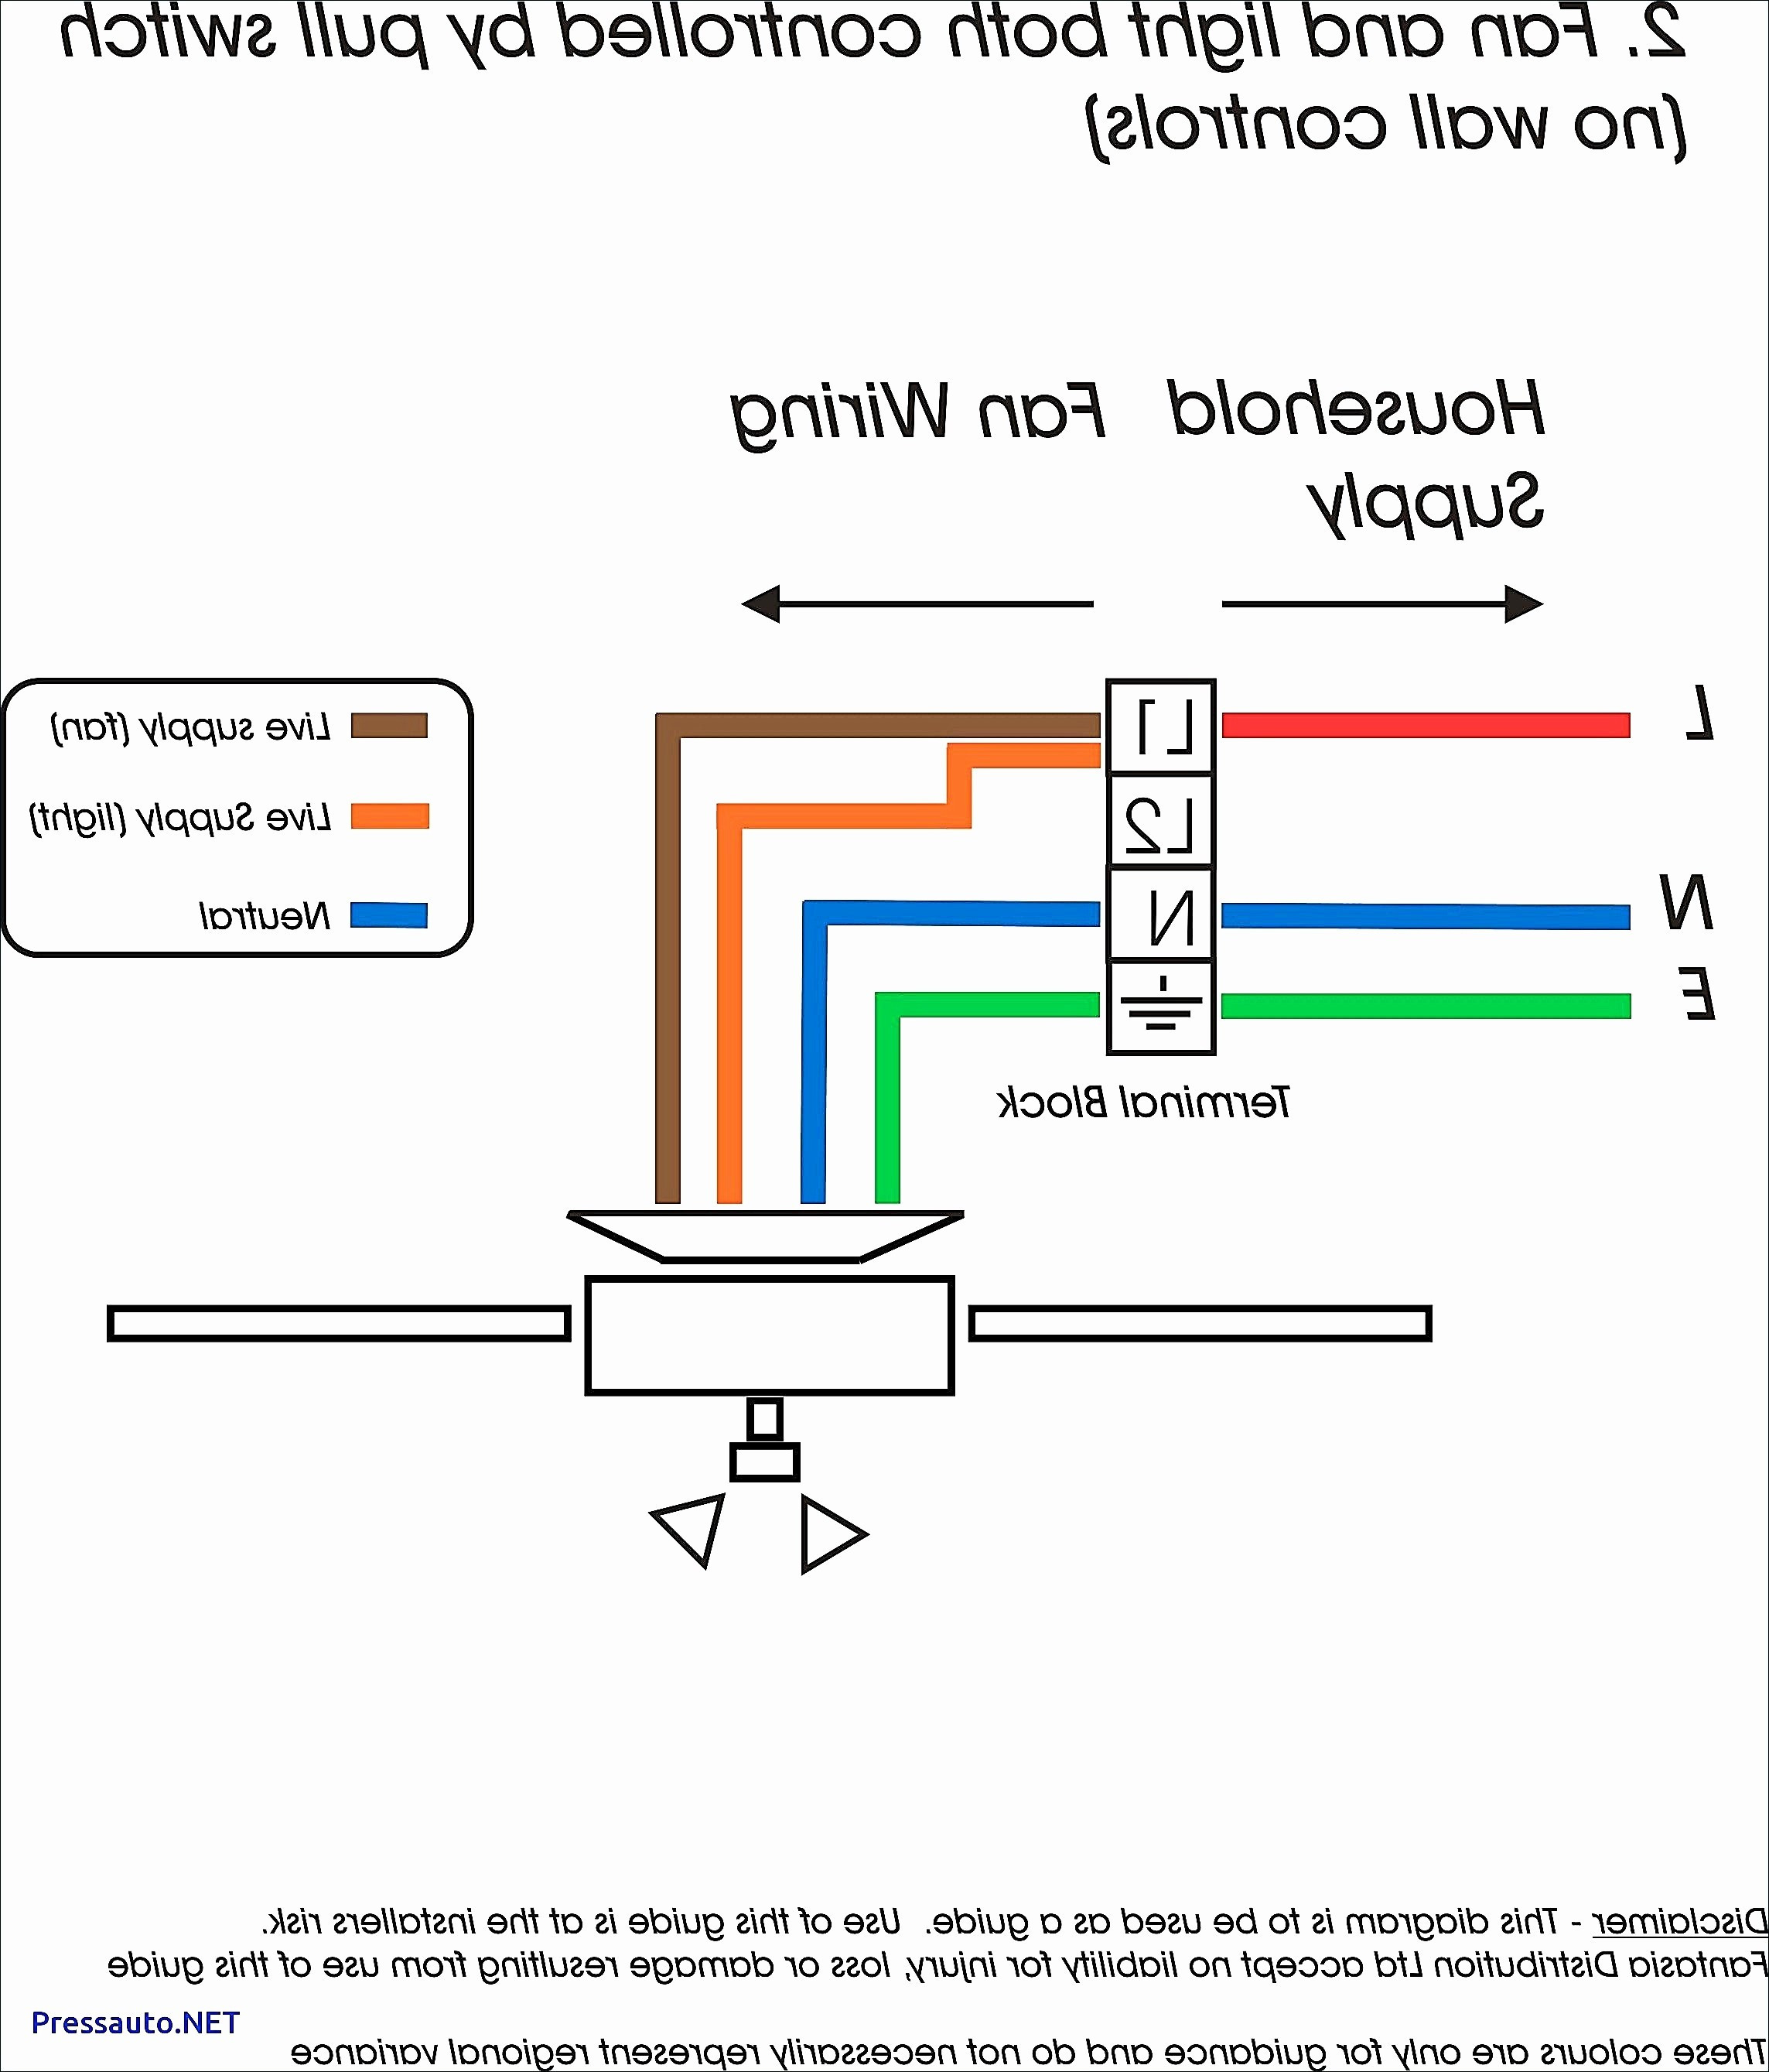 Electric Ez Go Wiring Diagram | Best Wiring Library - Club Car Wiring Diagram 48 Volt